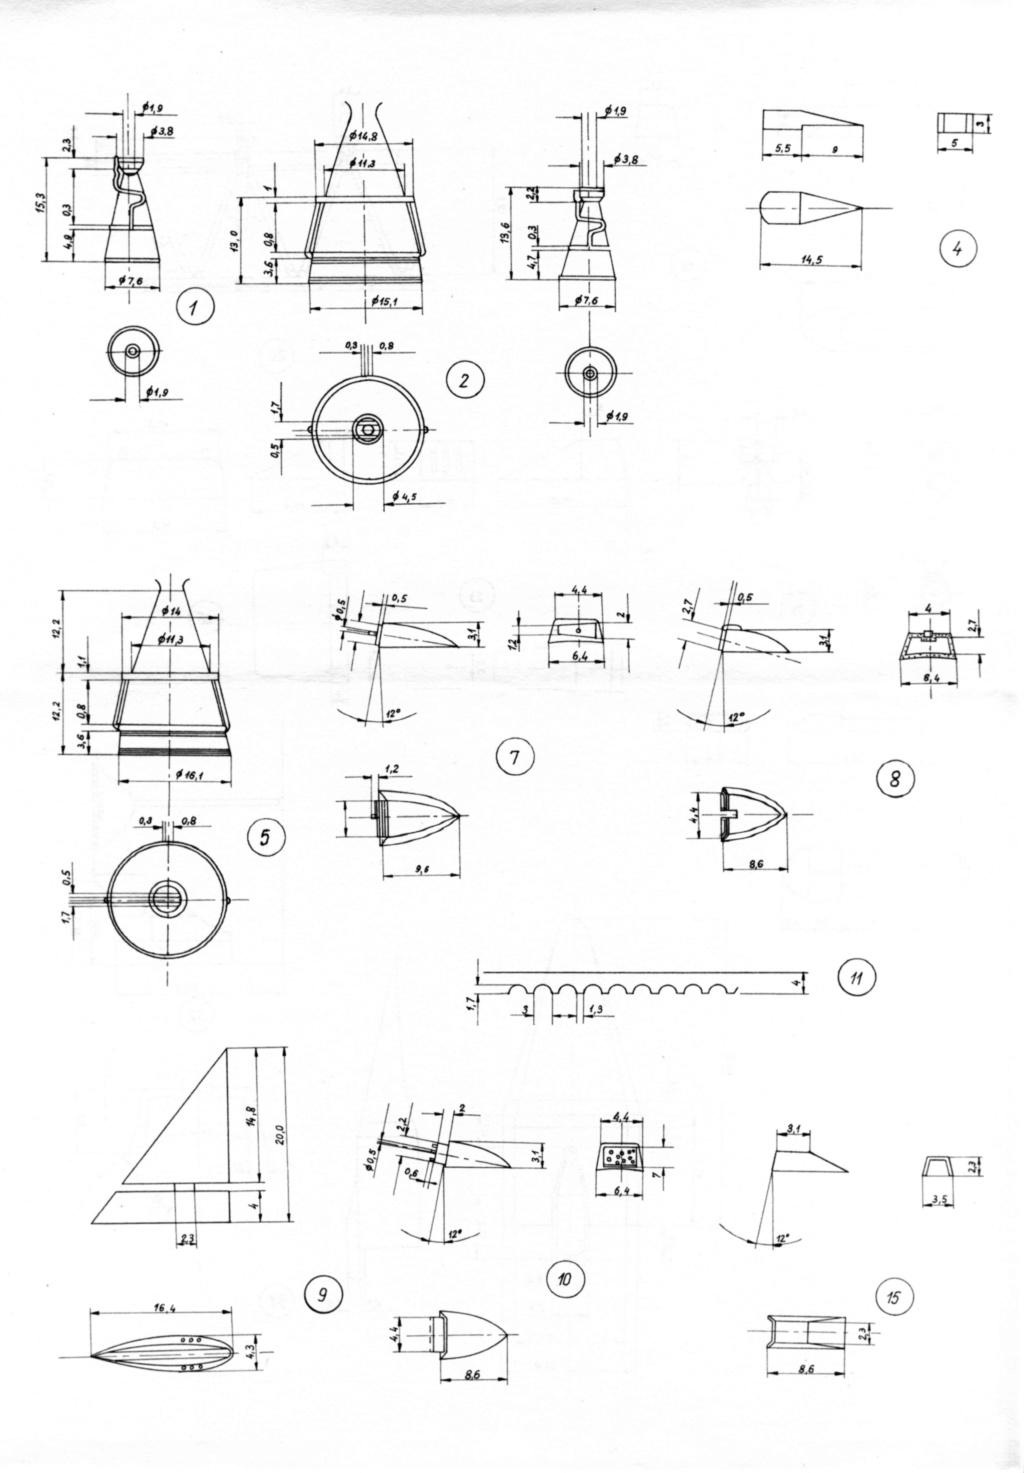 Vostok R7 Vostok13